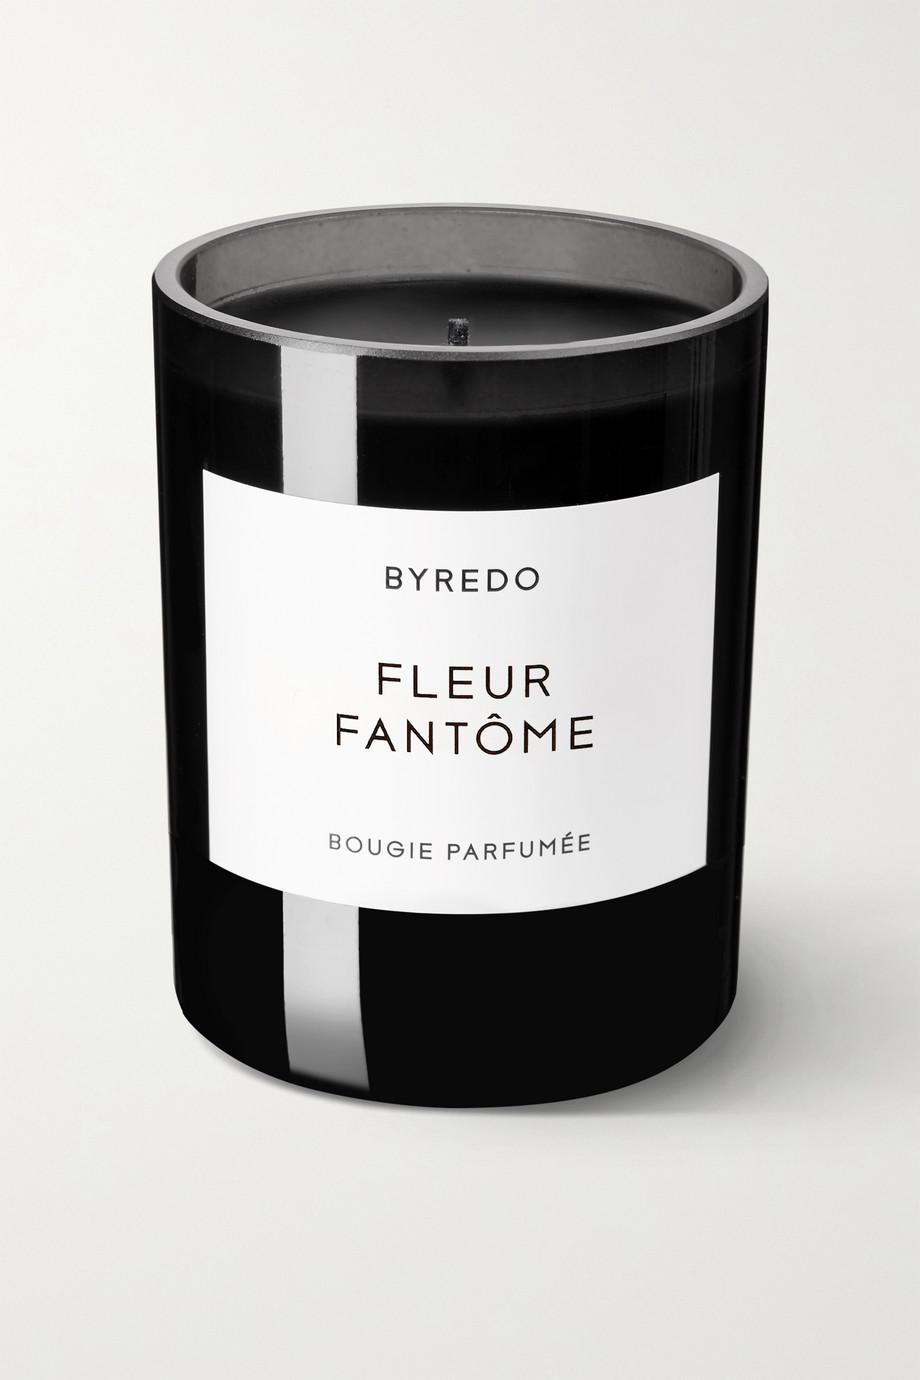 Byredo Fleur Fantôme scented candle, 240g